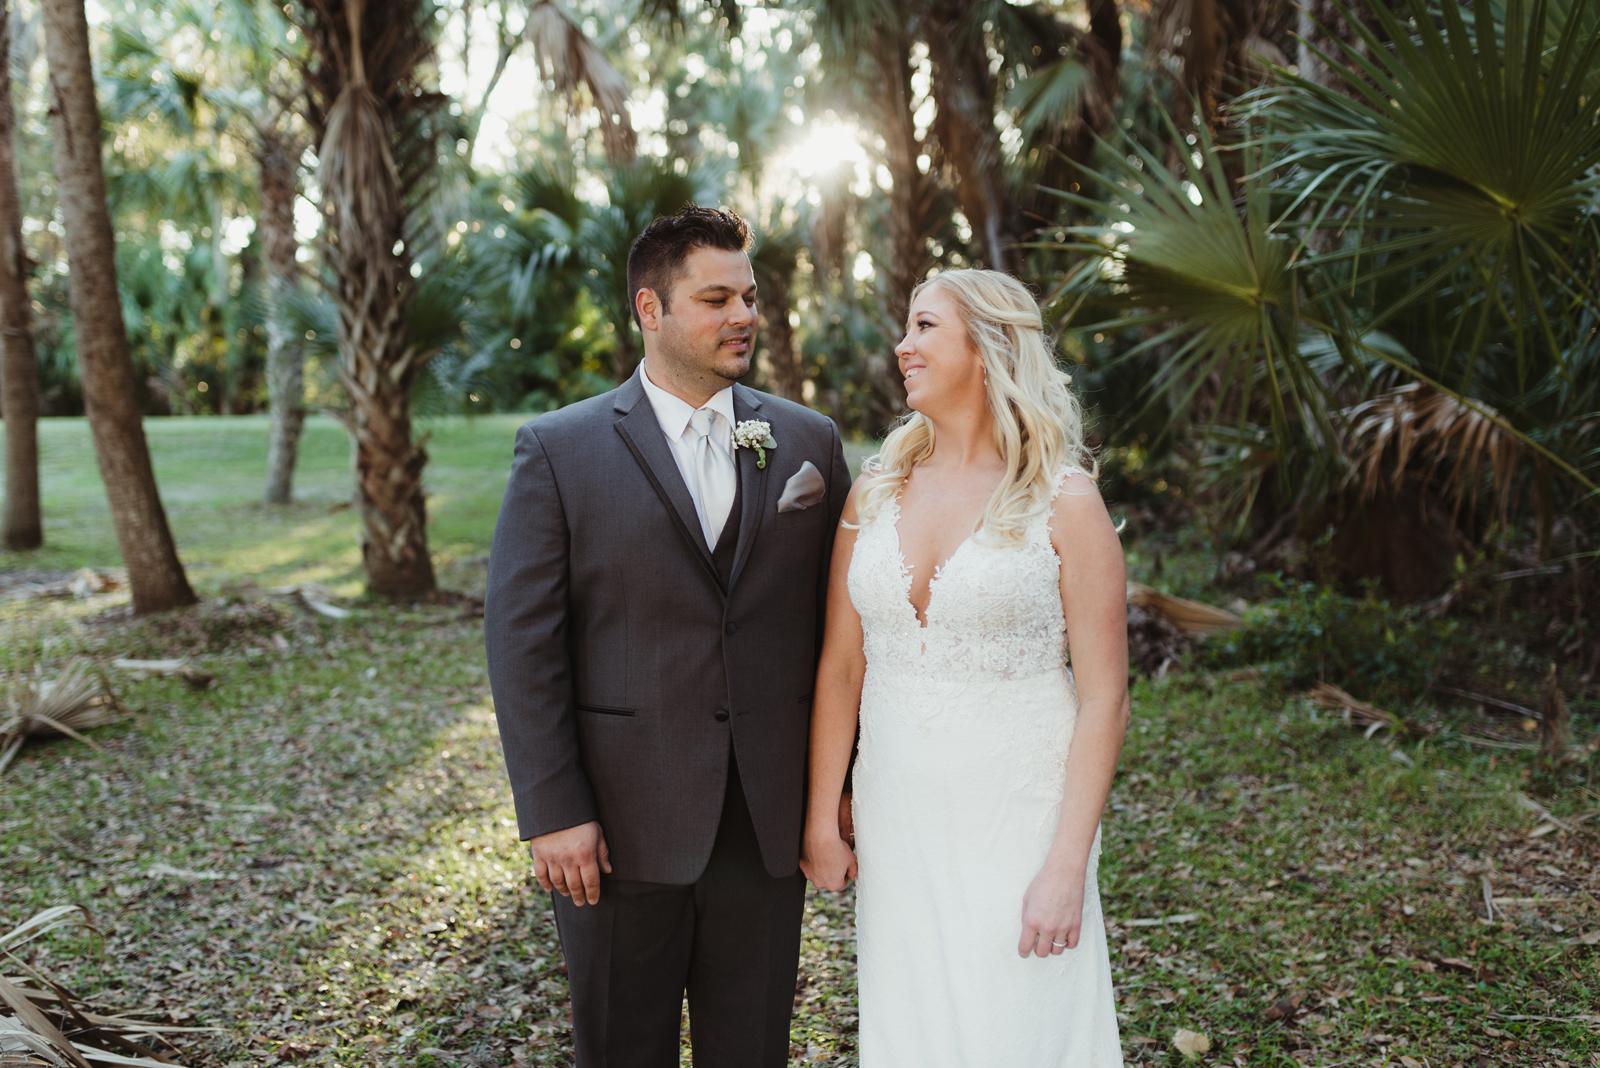 Tampa-Florida-Wedding-Photography_38.jpg